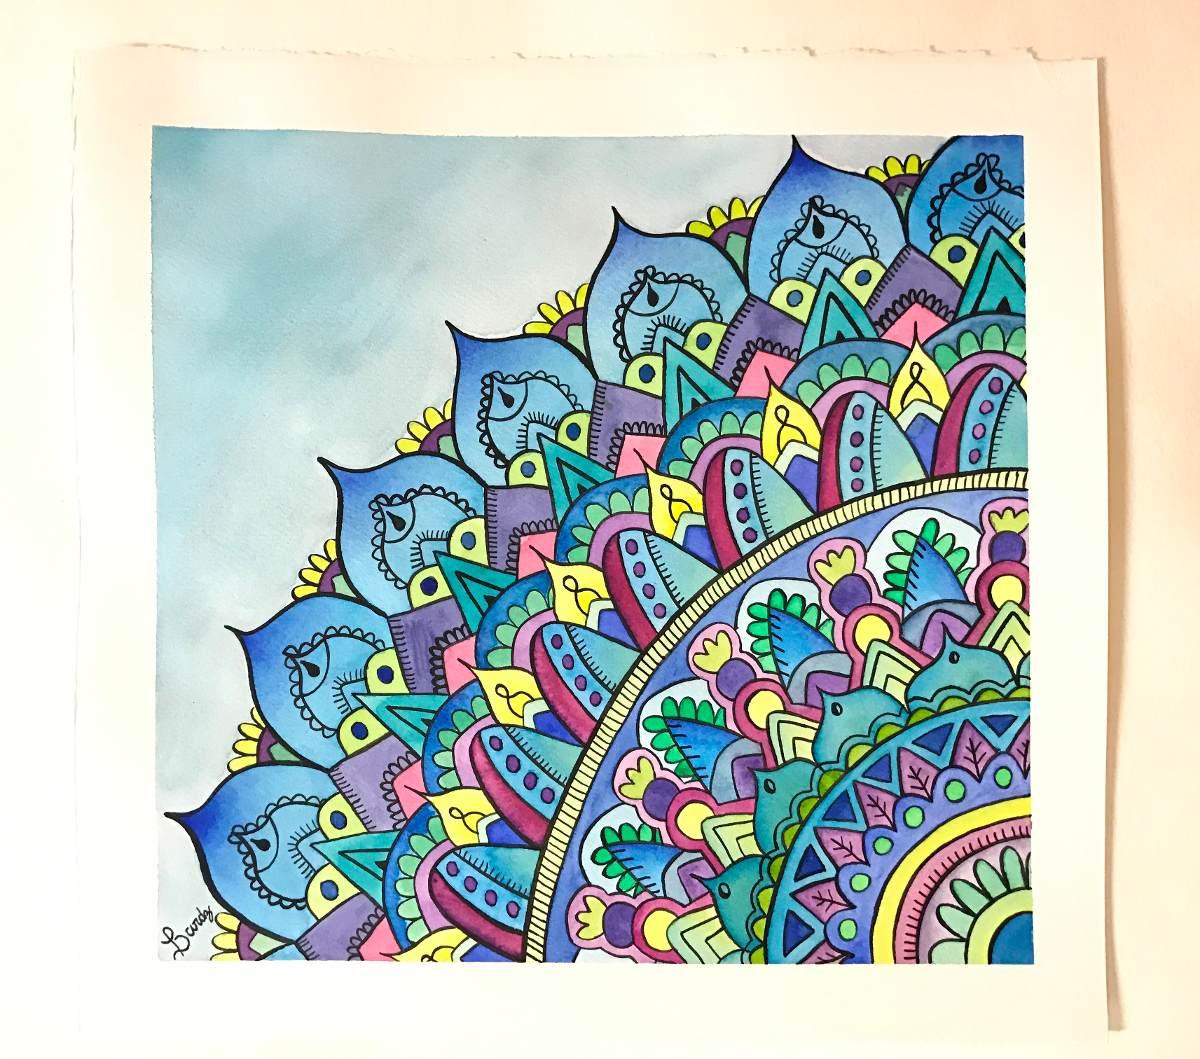 Cuadro Mandala Acuarela Decoracion Pintura 35000 En Mercado Libre - Pinturas-de-mandalas